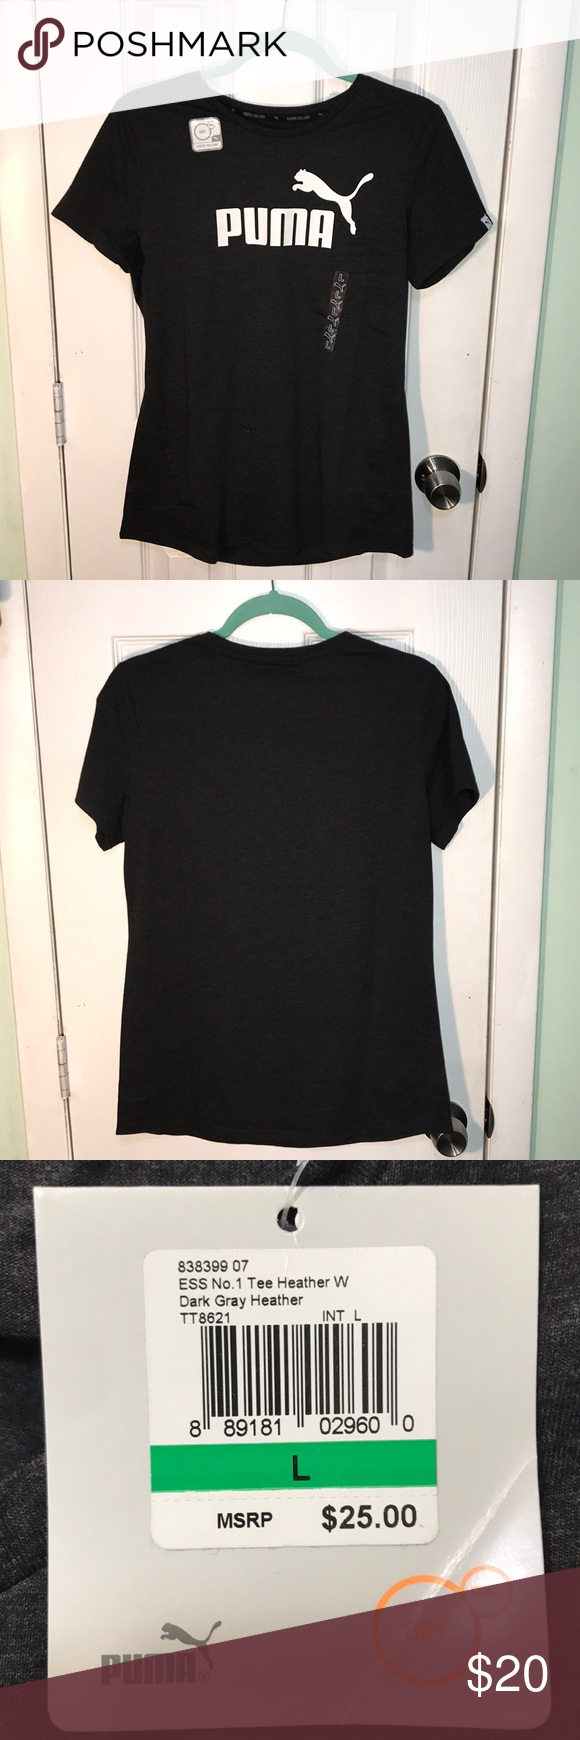 new product 9856e 9f6e2 Women s Boyfriend Logo T-Shirt Short sleeve dark gray Heather Puma tee.  Never worn! Puma Tops Tees - Short Sleeve